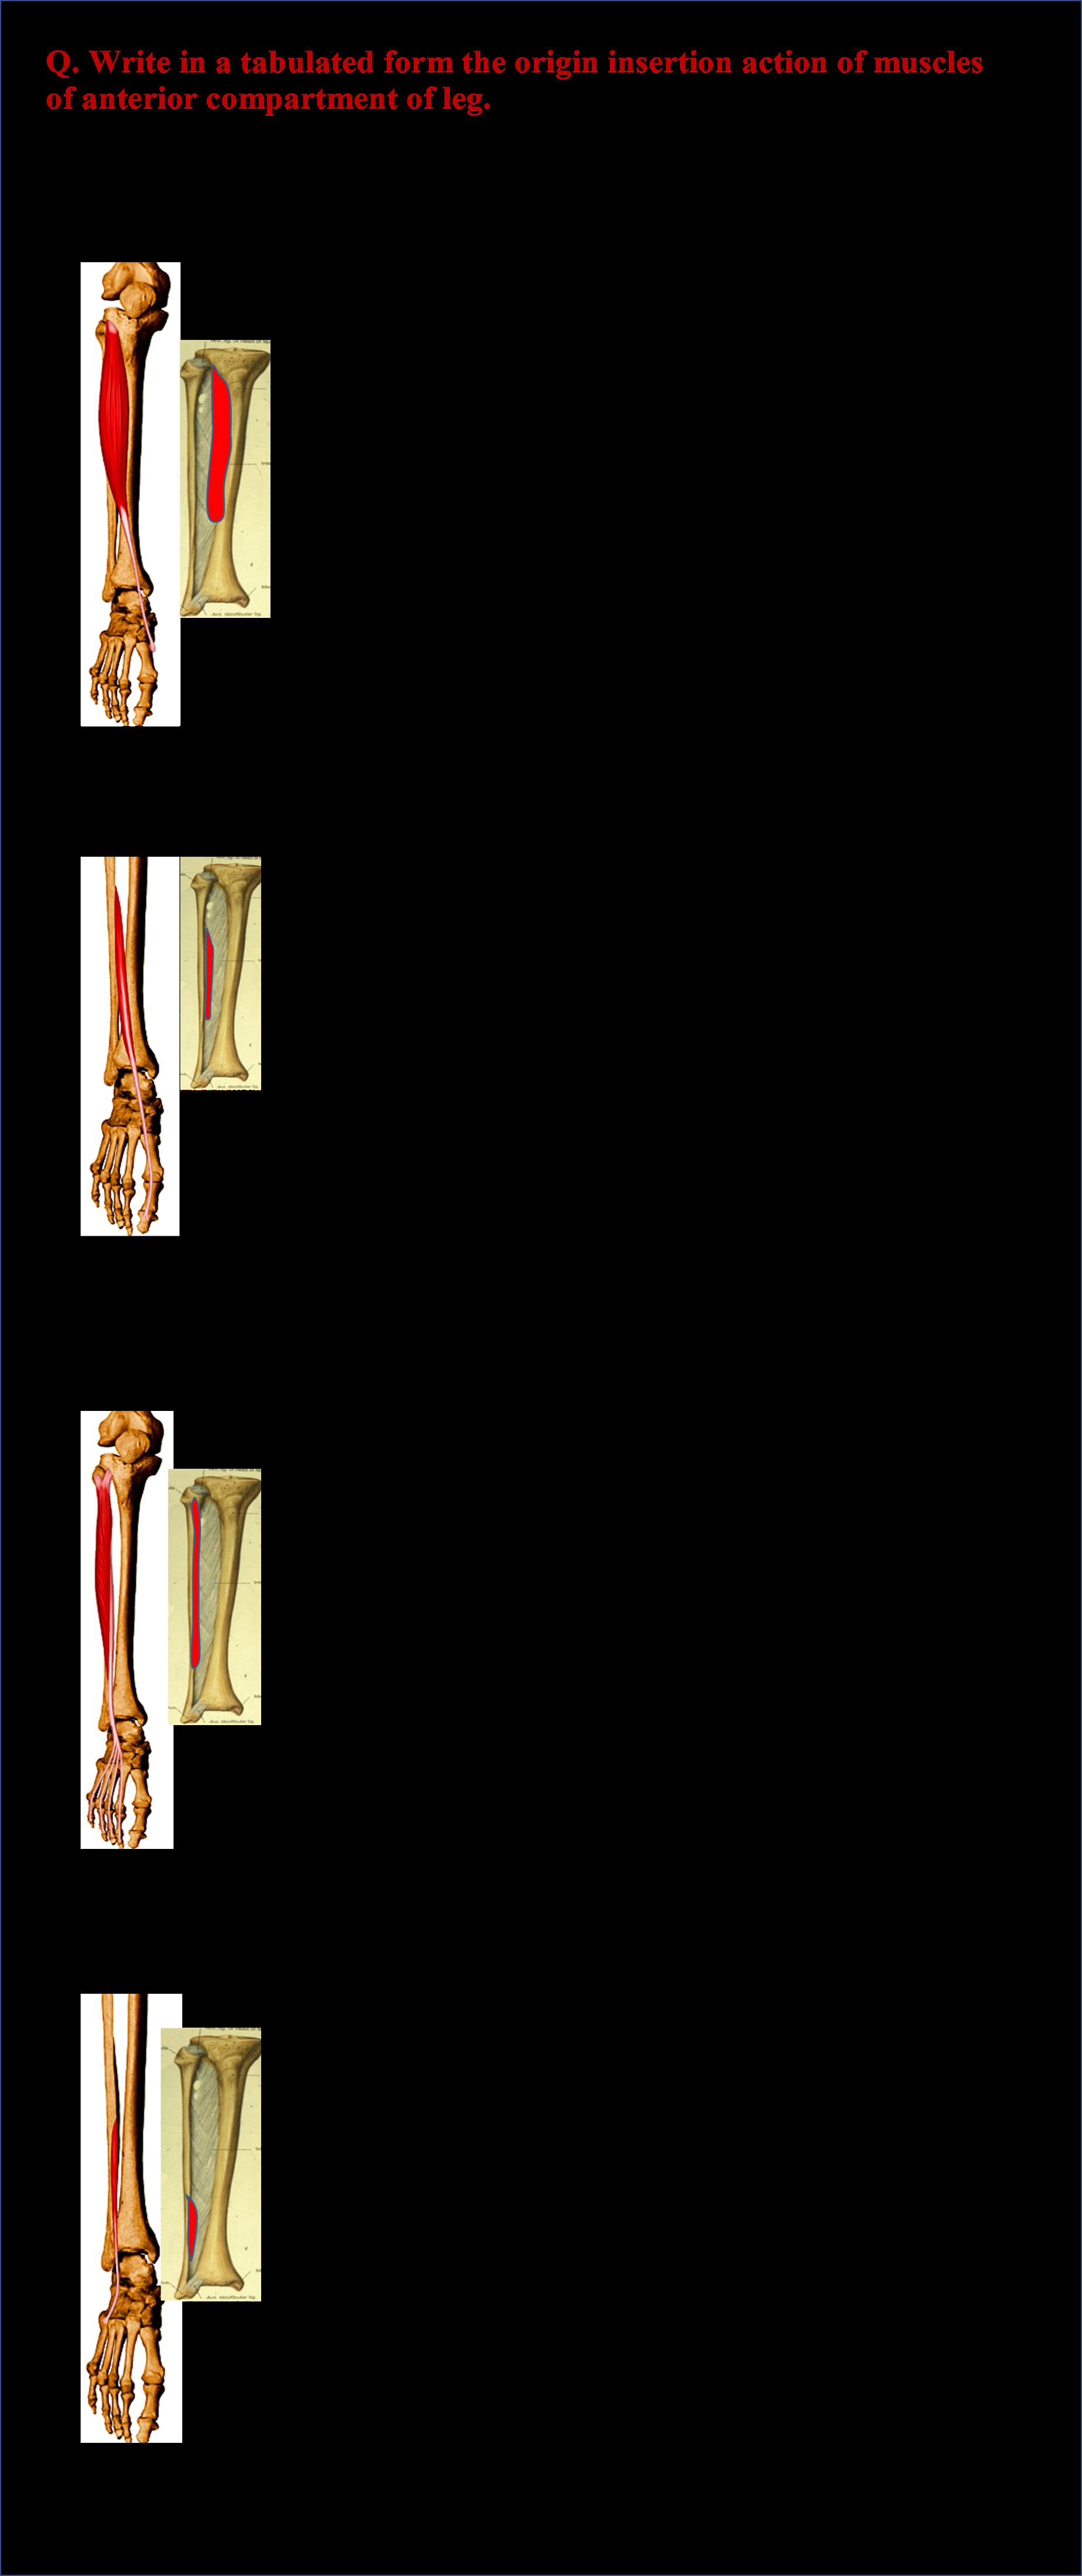 Posterior leg anatomy